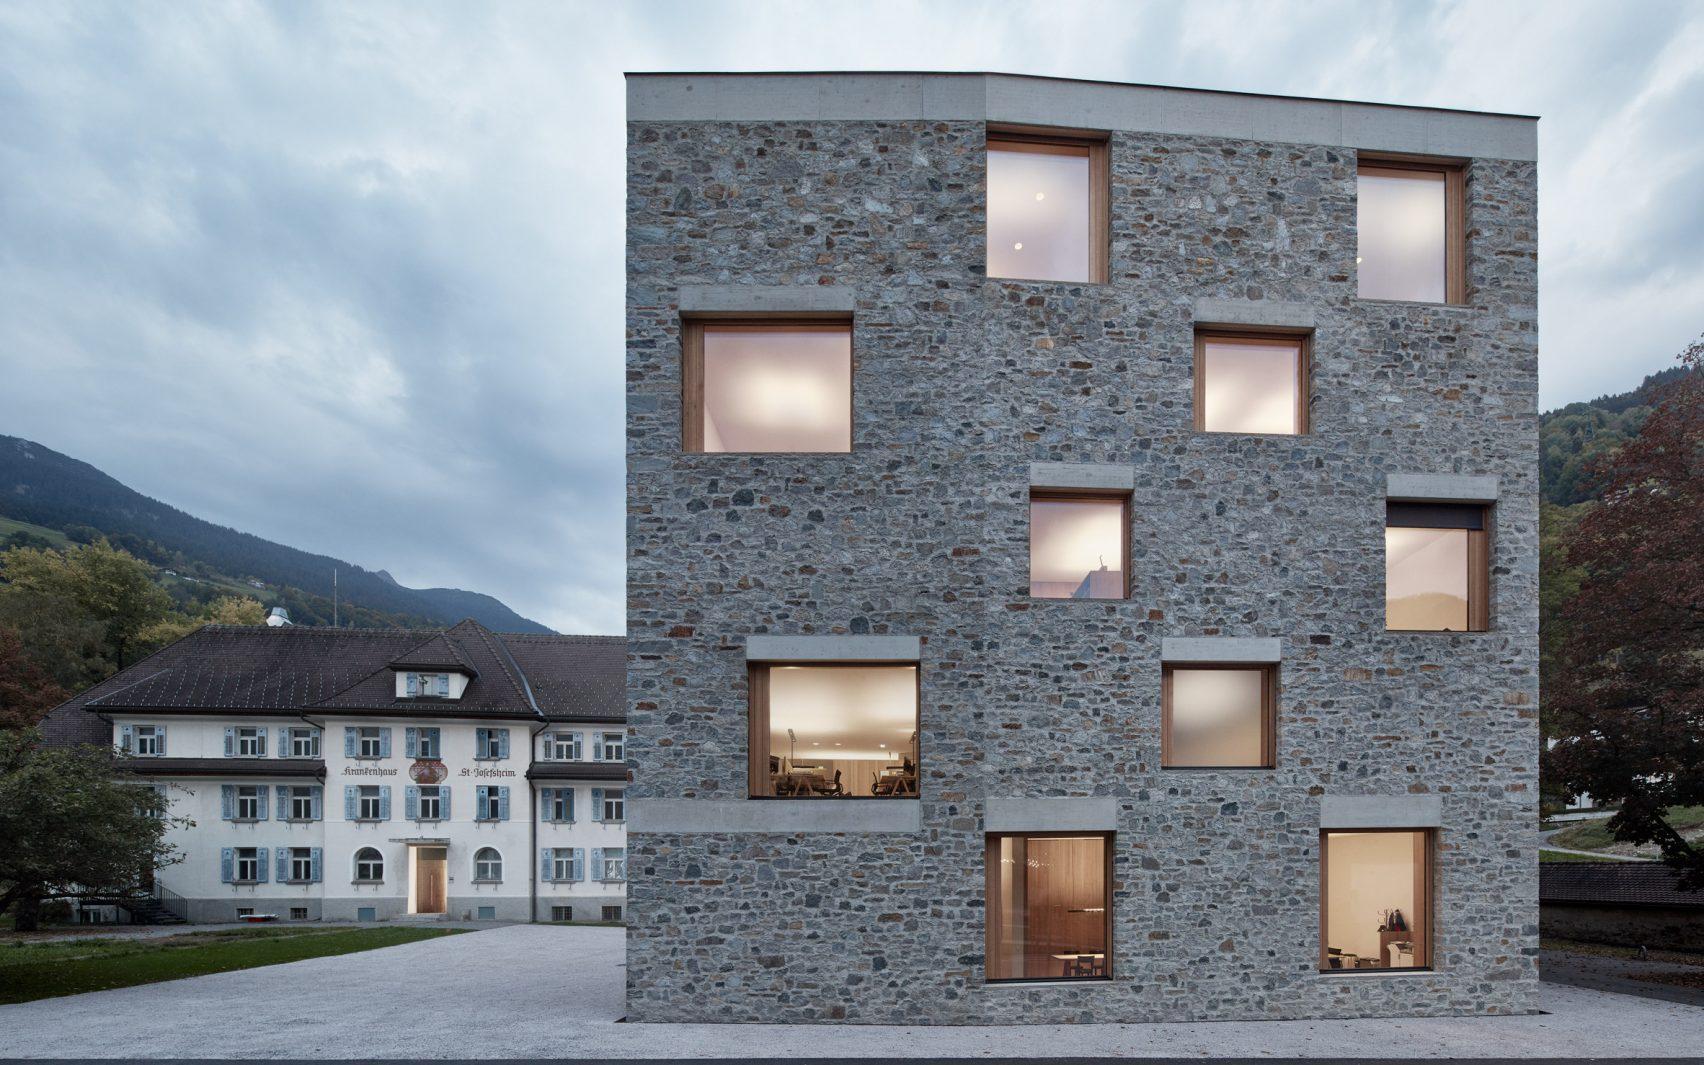 Alpin Sport ski centre by Bernardo Bader Architekten